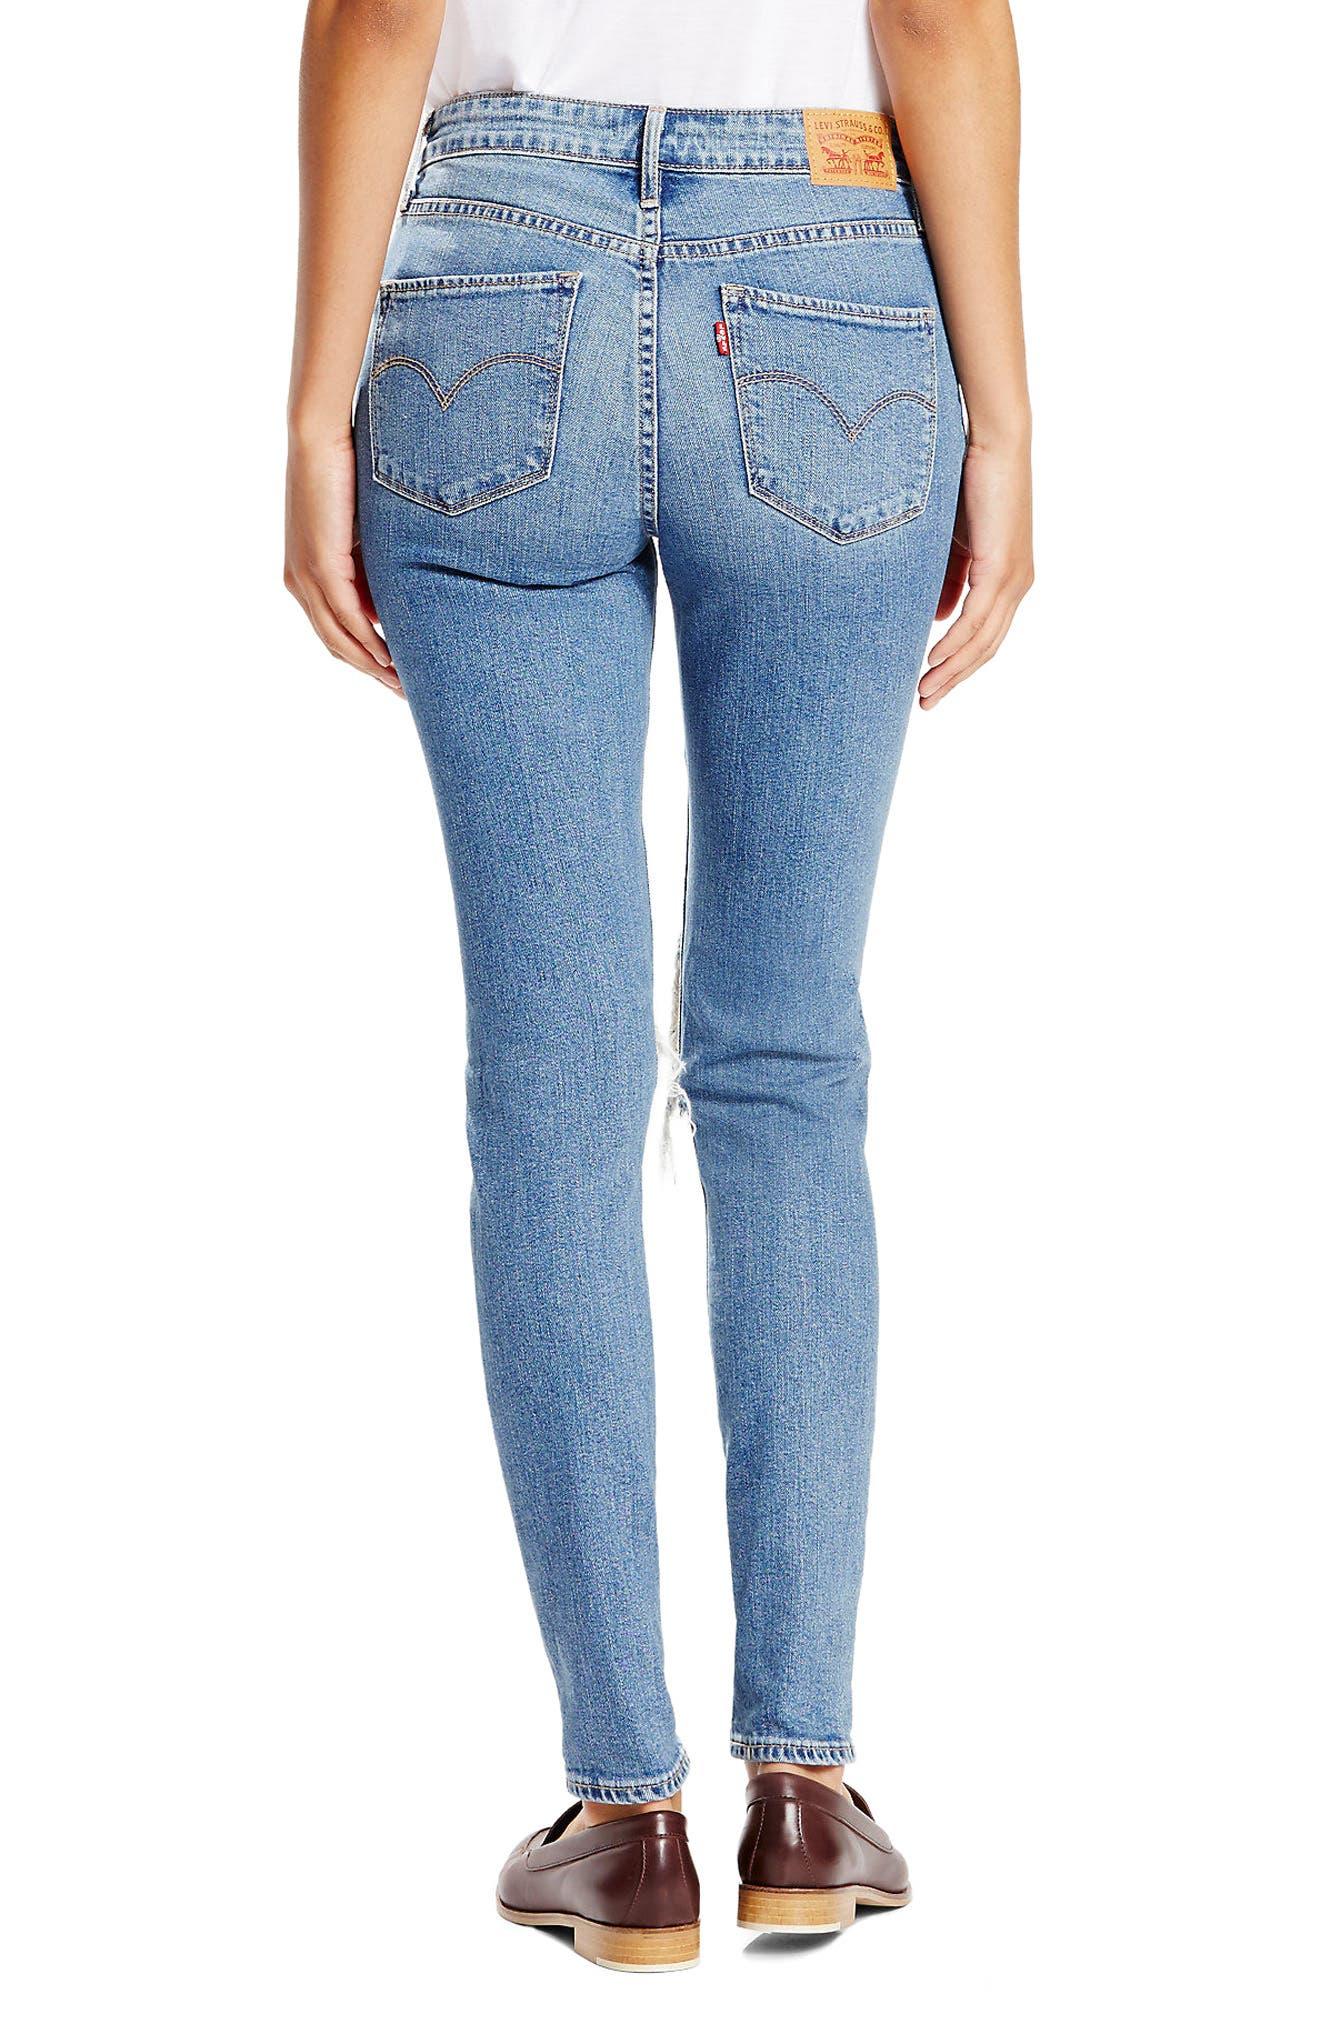 Alternate Image 2  - Levi's® 721 Ripped High Waist Skinny Jeans (Rugged Indigo)